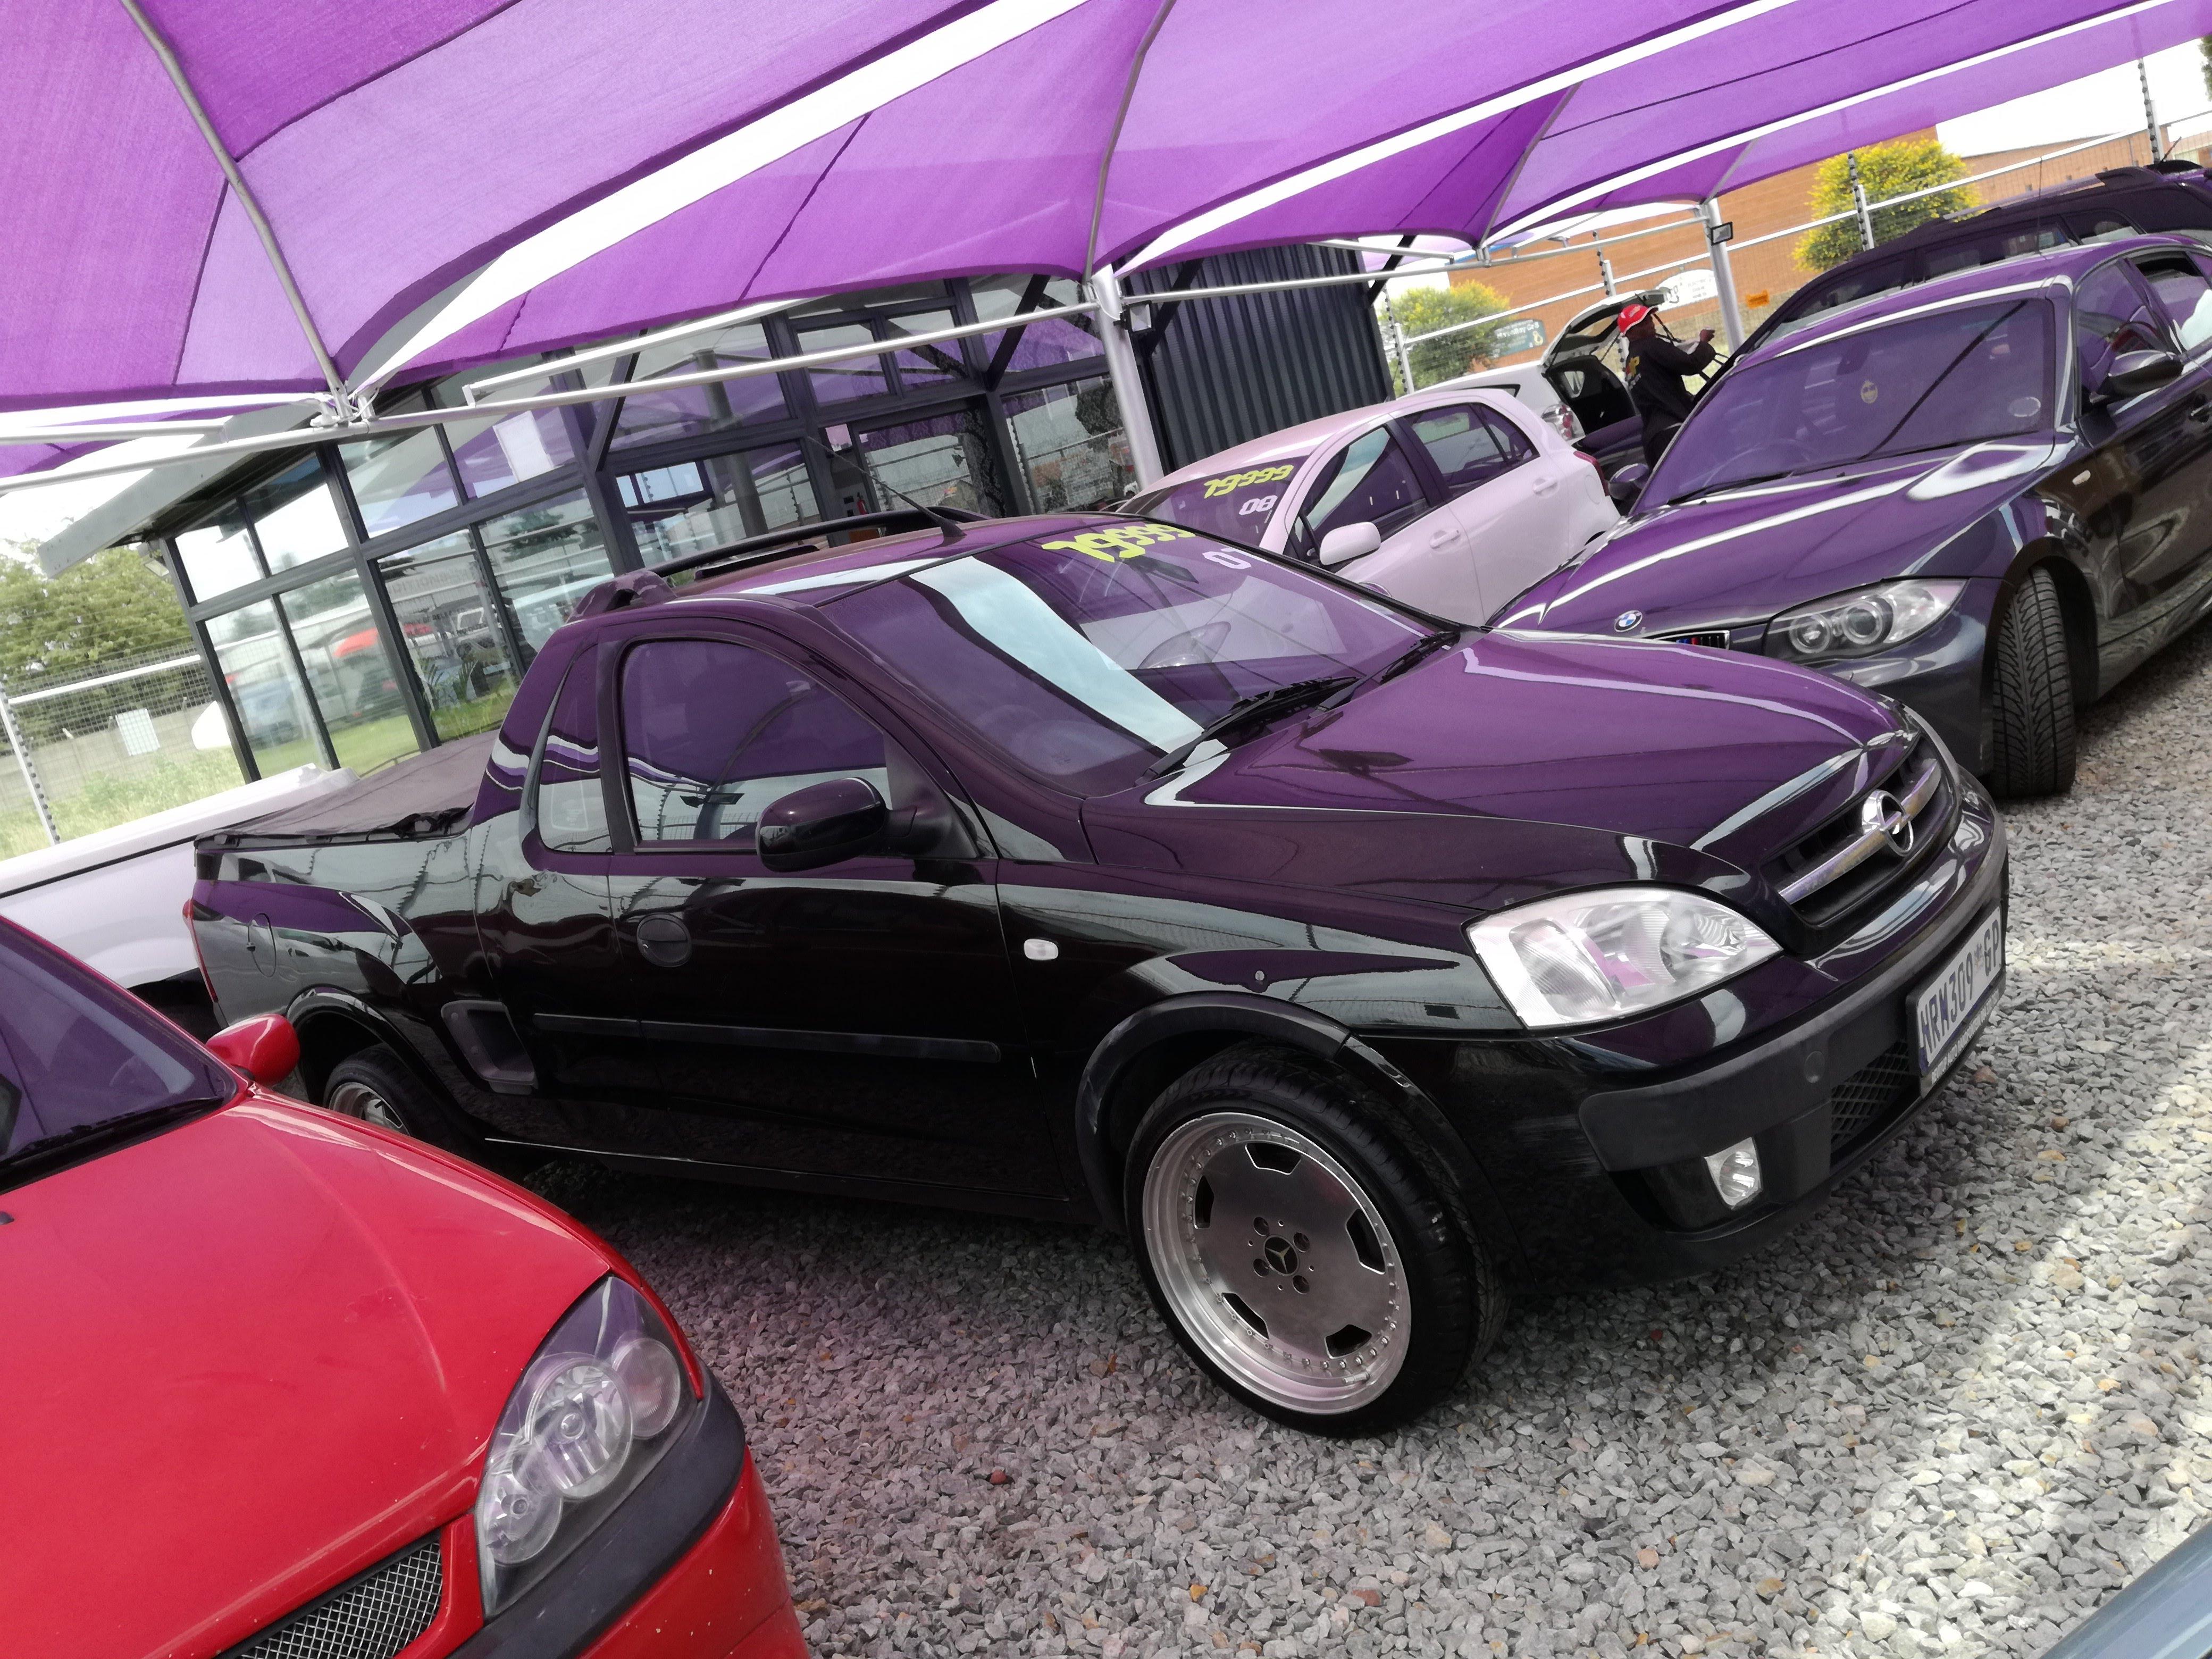 Opel Corsa Pick Up full